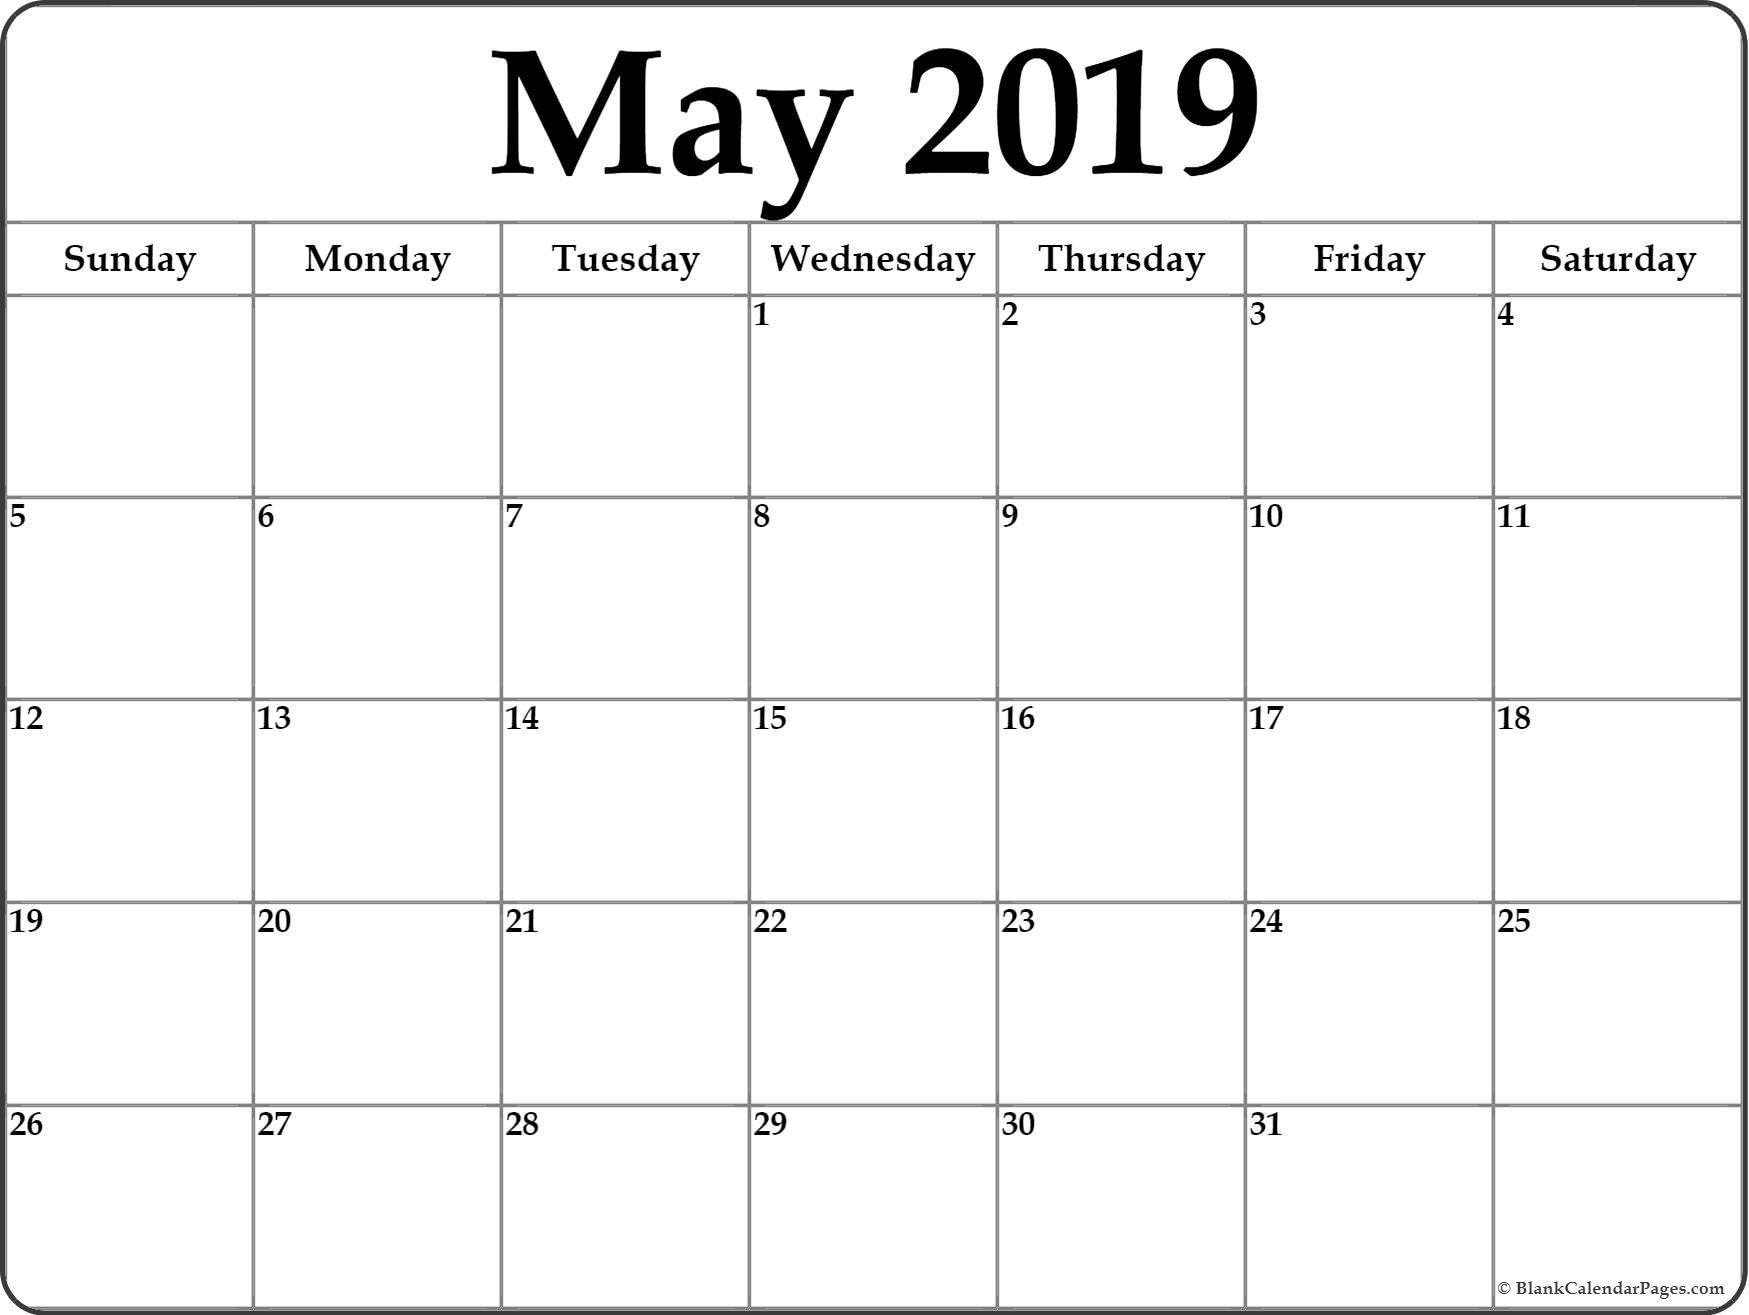 May 2019 Calendar | Free Printable Monthly Calendars-At A Glance Monthly Calendar Printable